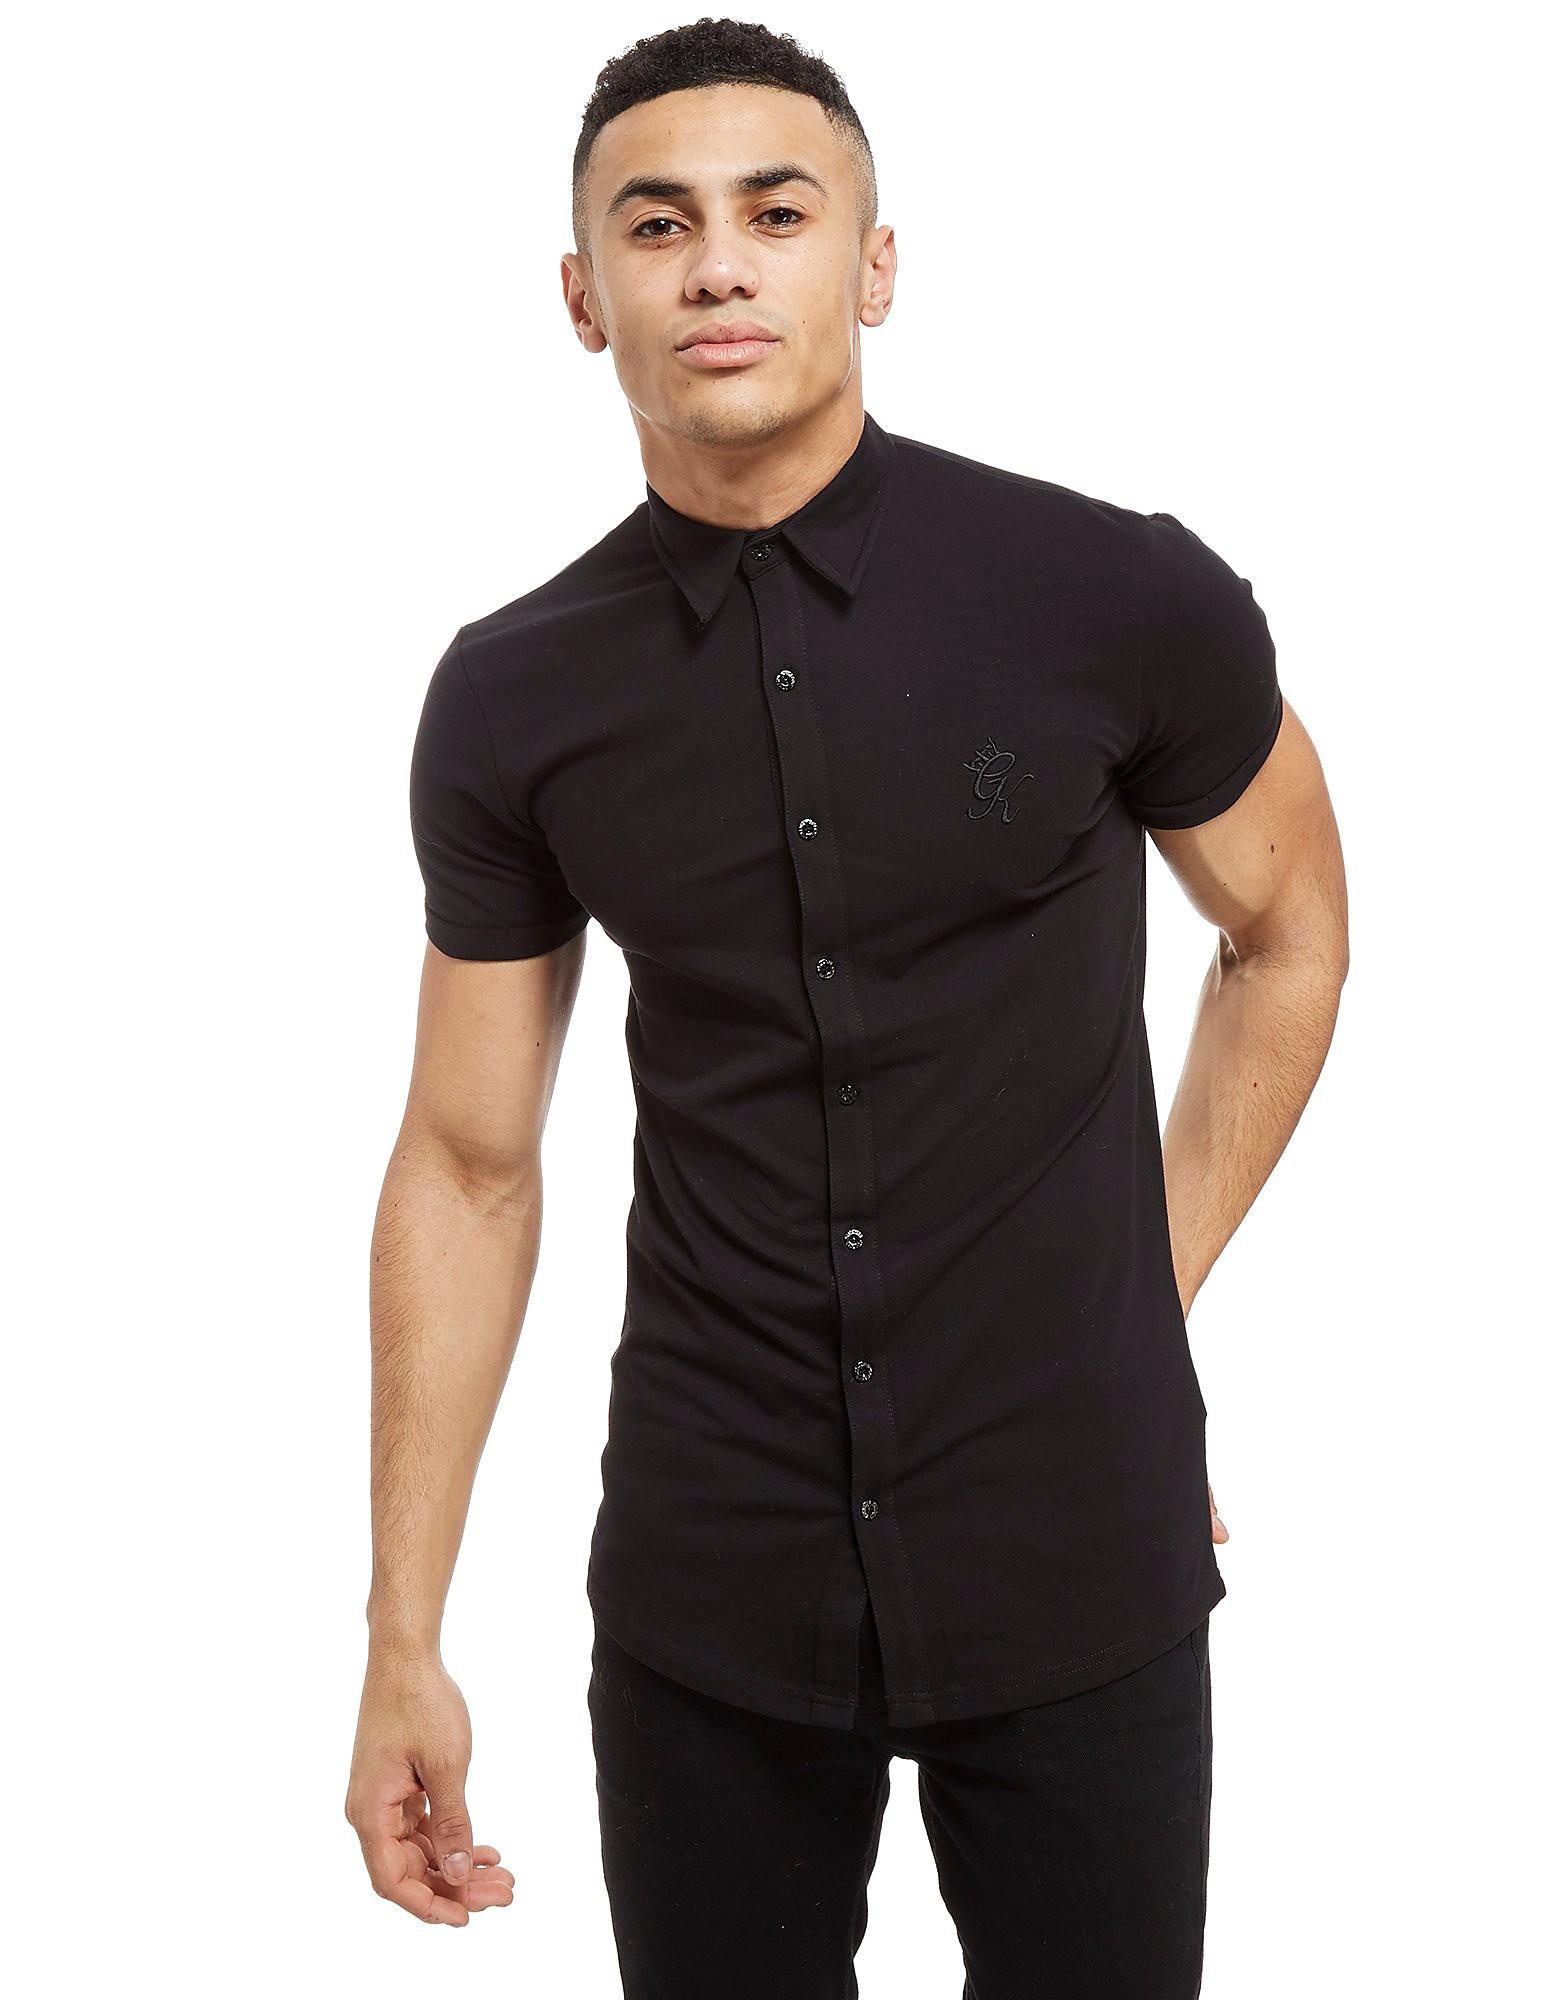 Gym King Core Short Sleeve Shirt